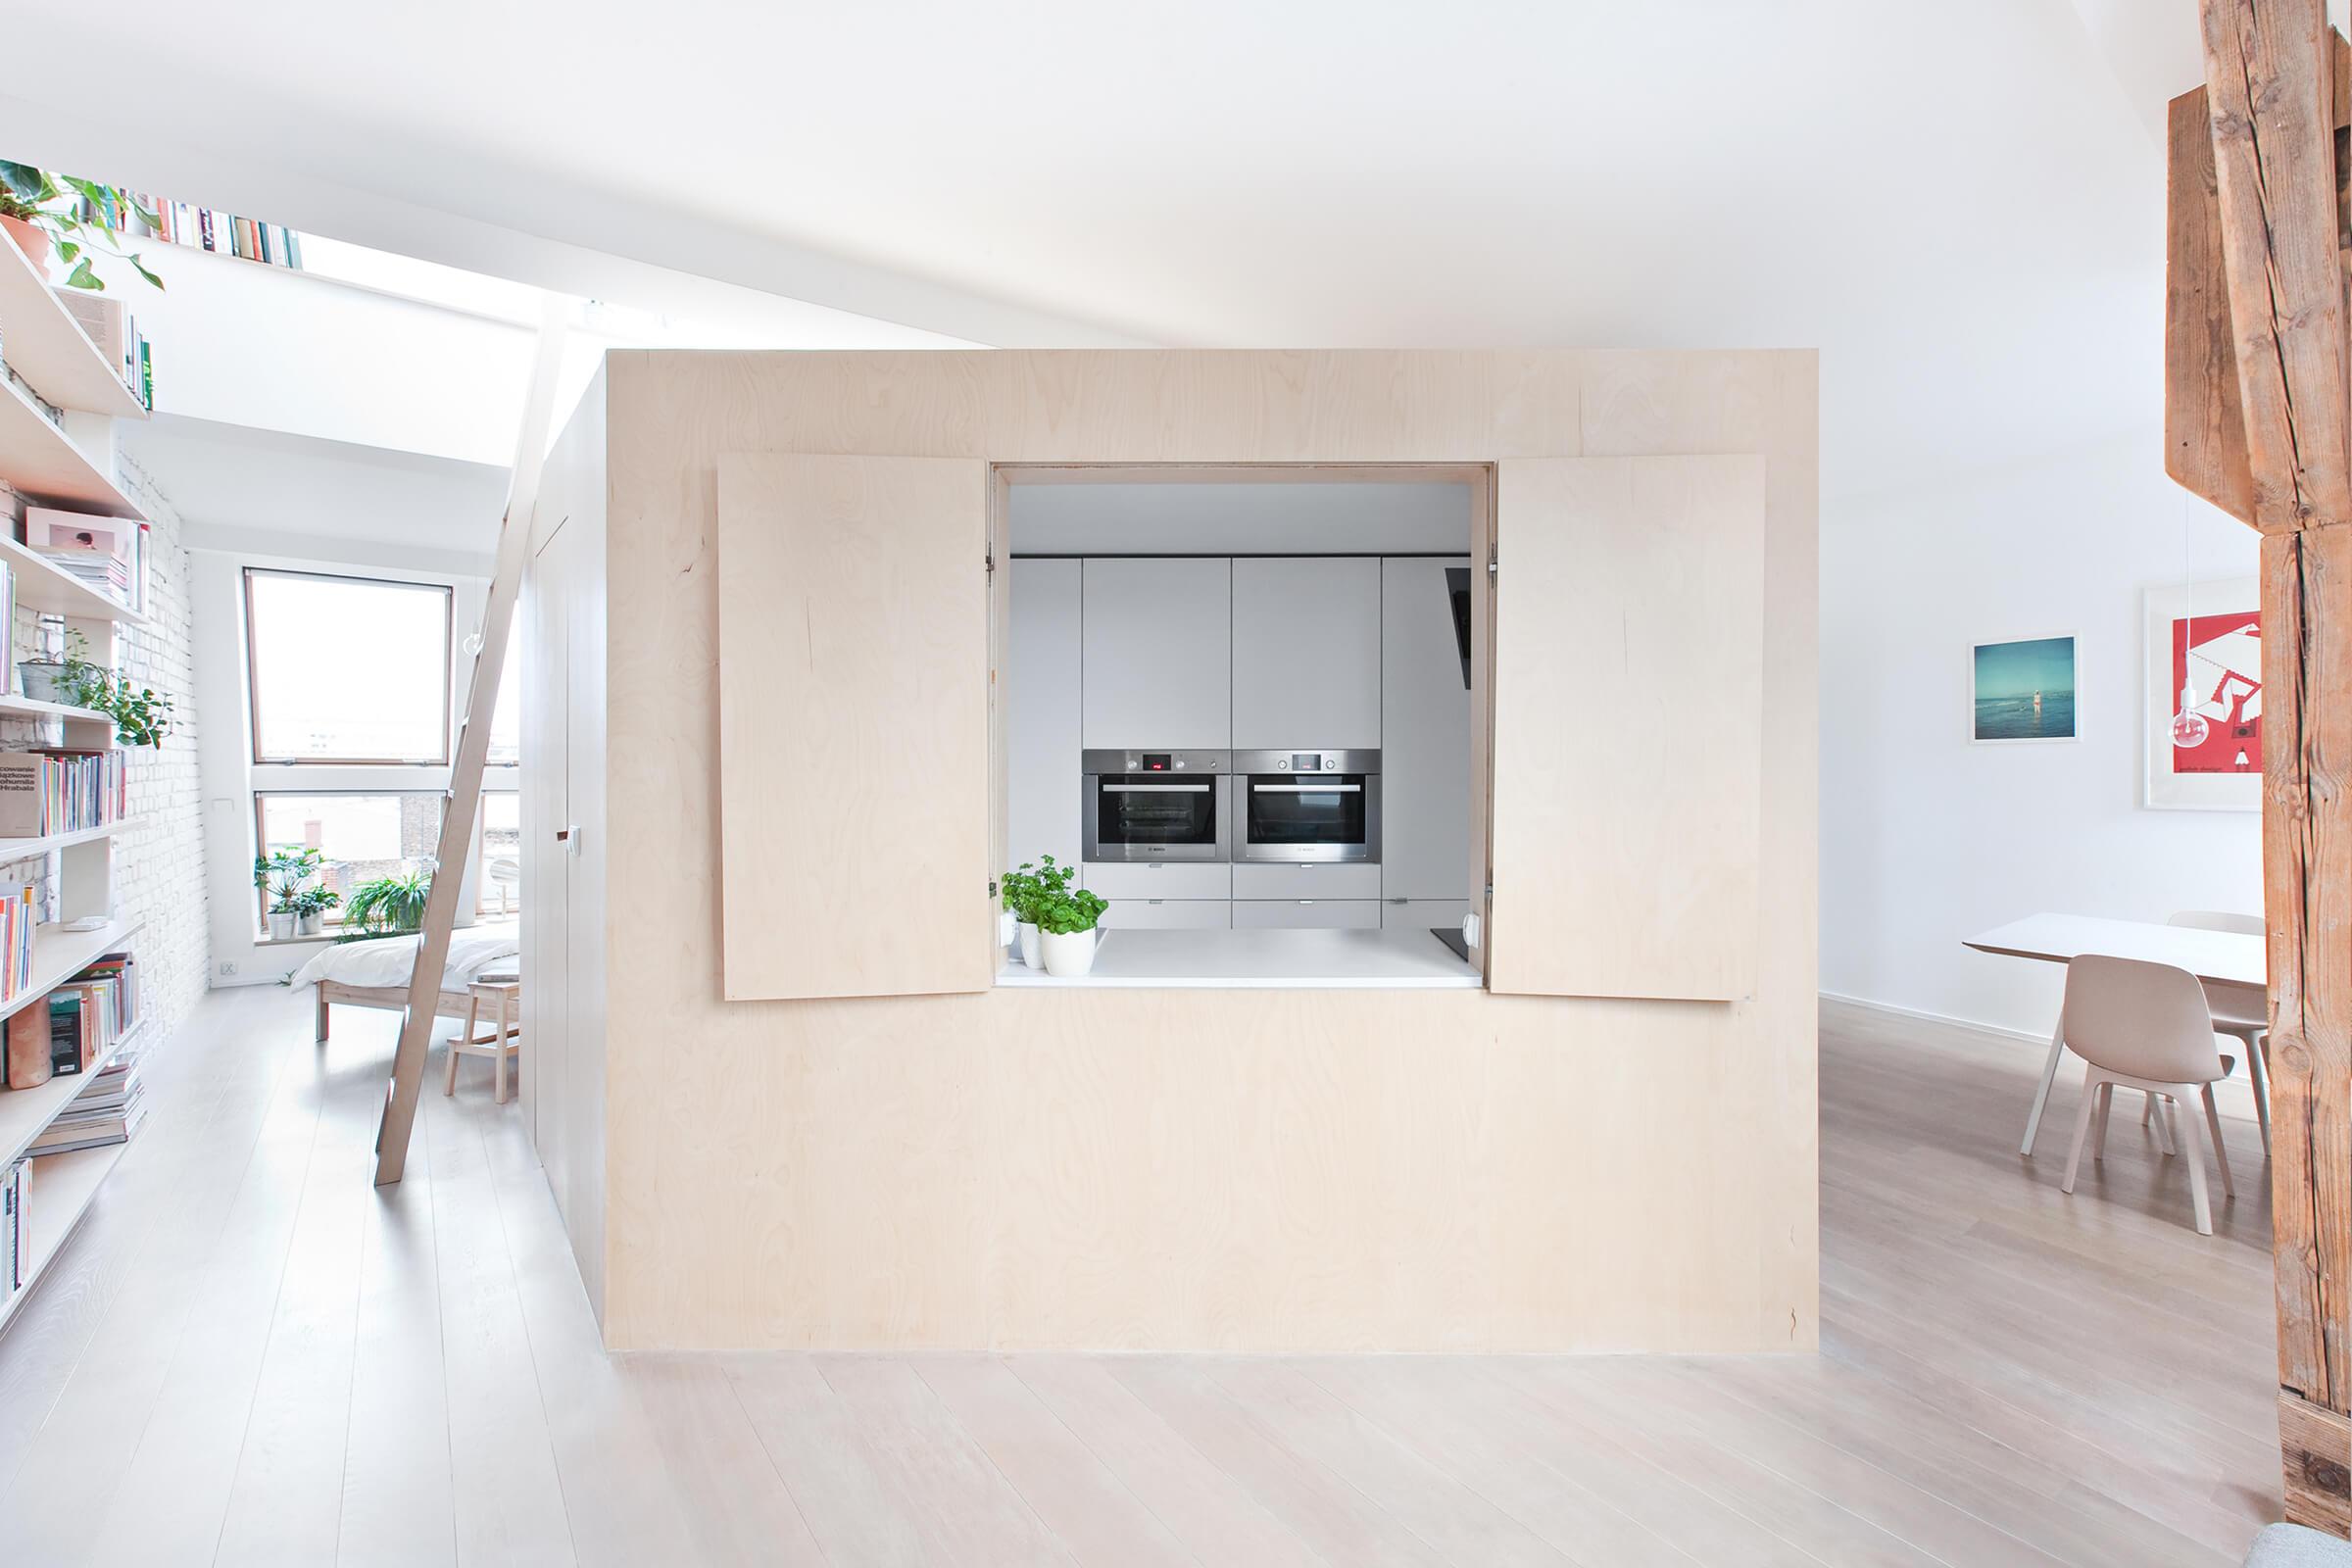 Island Apartment, Poznan, PL